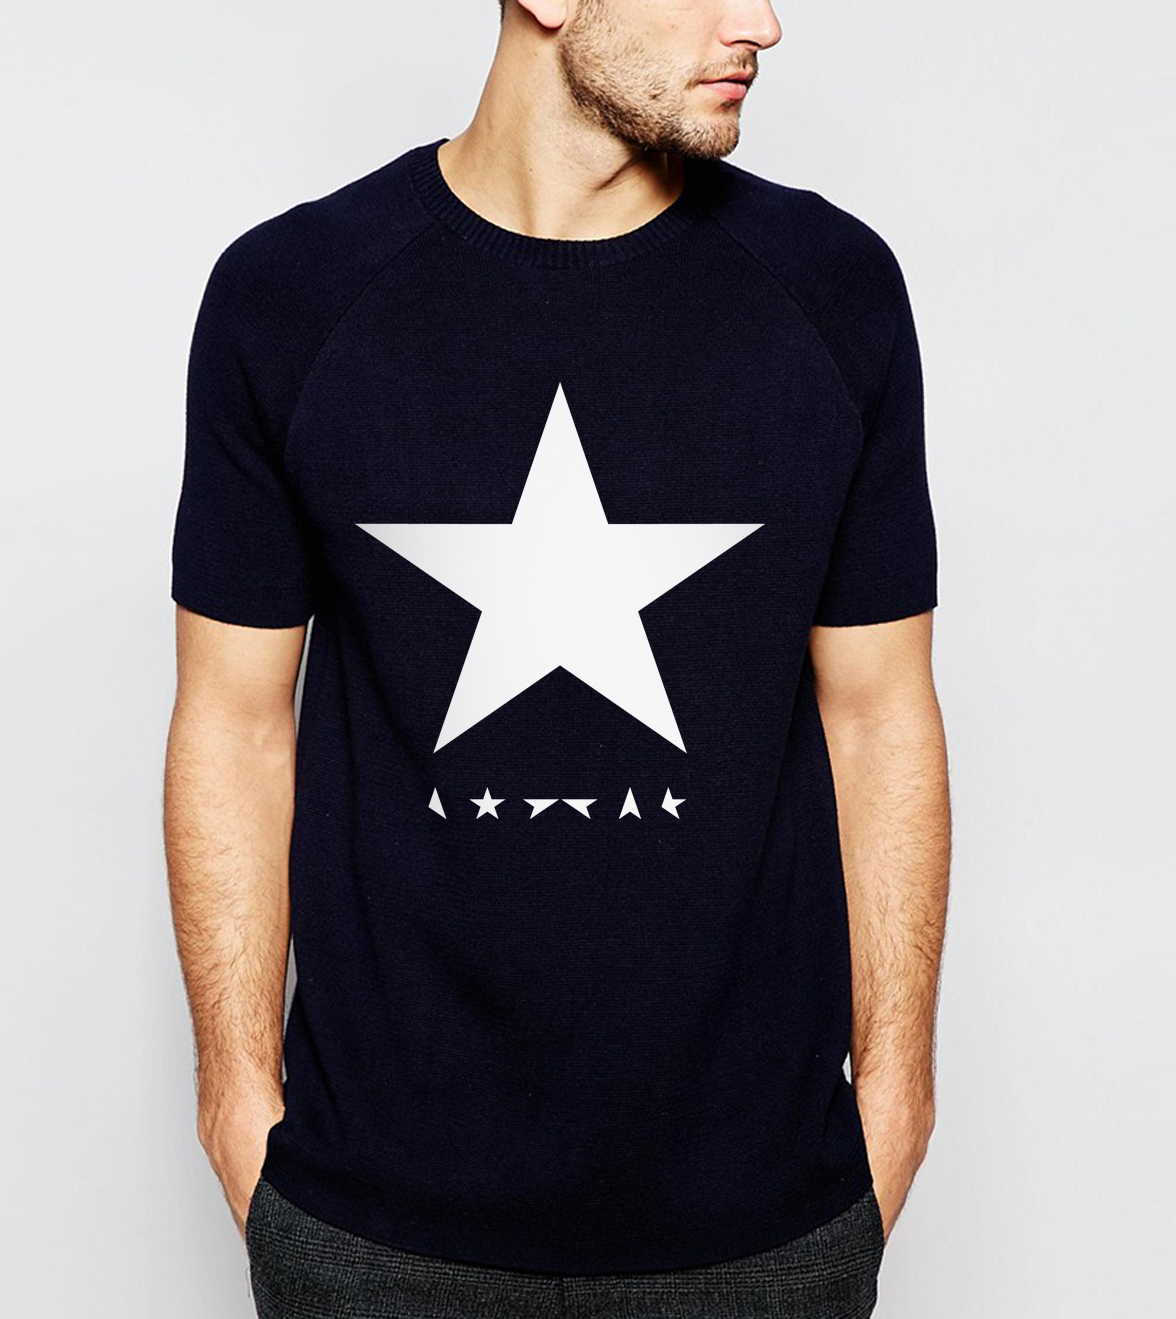 2017 summer David Bowie <font><b>black</b></font> <font><b>star</b></font> men t shirts 100% cotton high quality streetwear casual hipster tops tees brand t-shirt